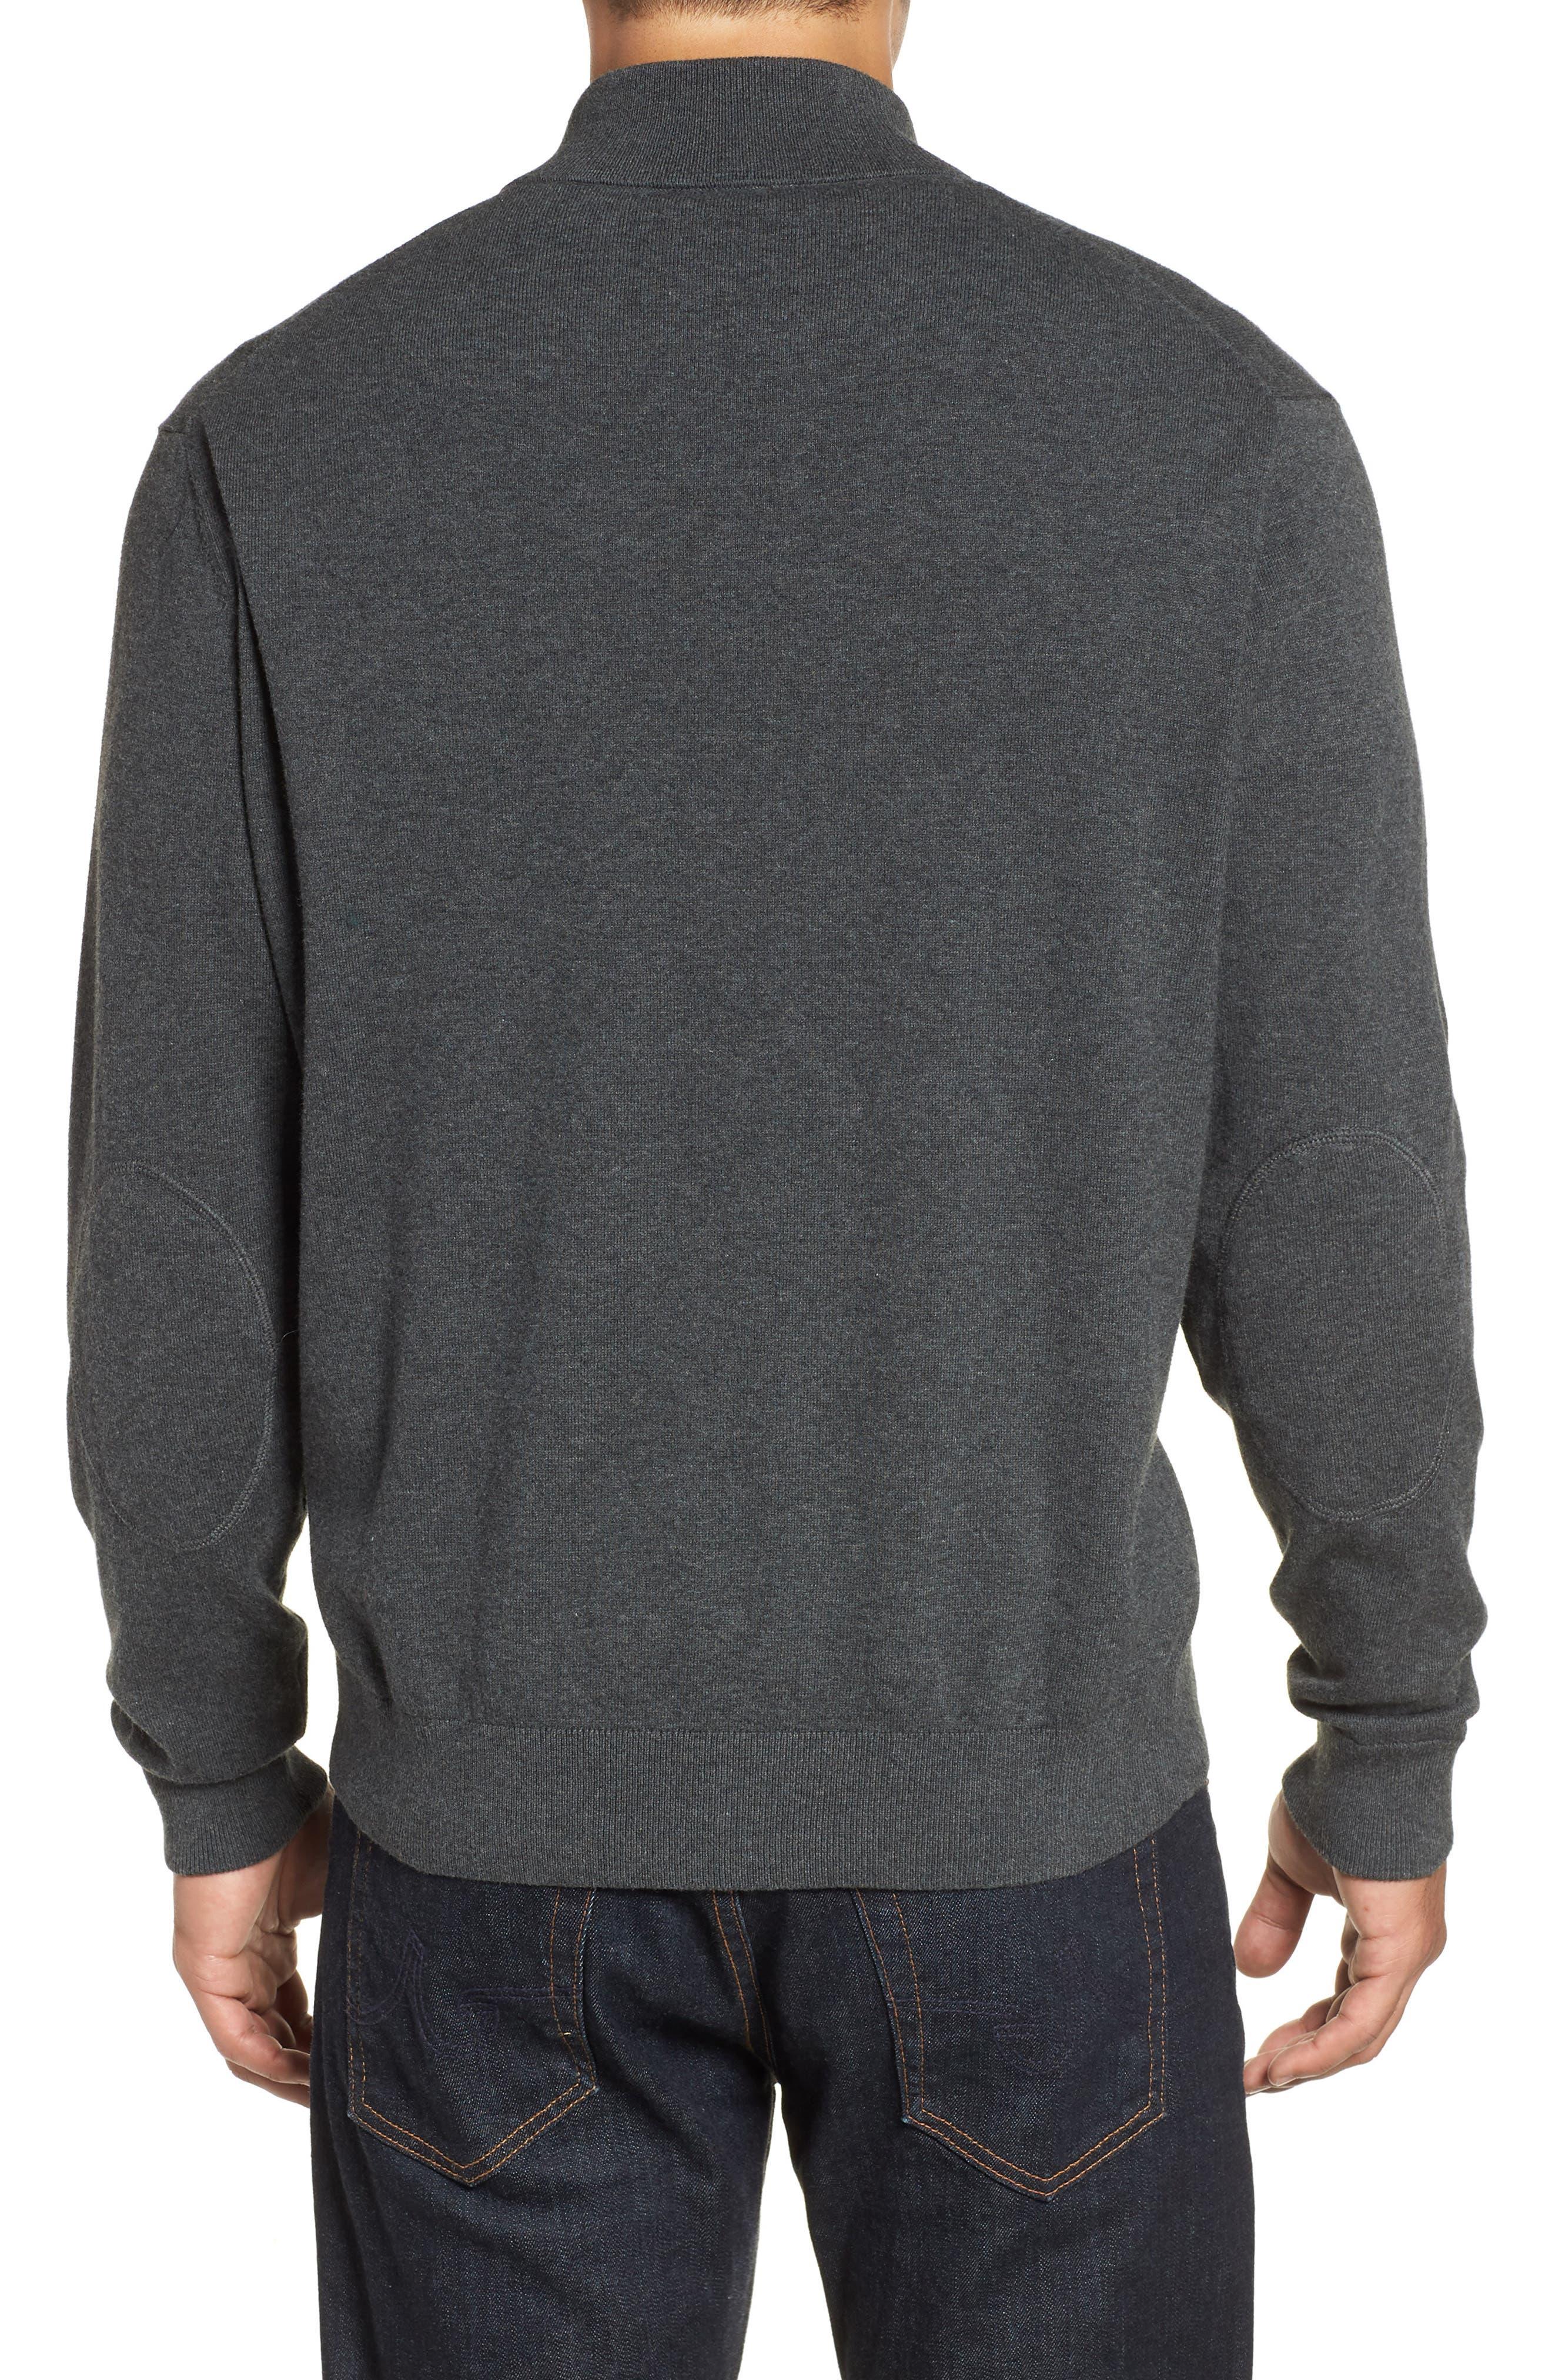 Denver Broncos - Lakemont Regular Fit Quarter Zip Sweater,                             Alternate thumbnail 2, color,                             018